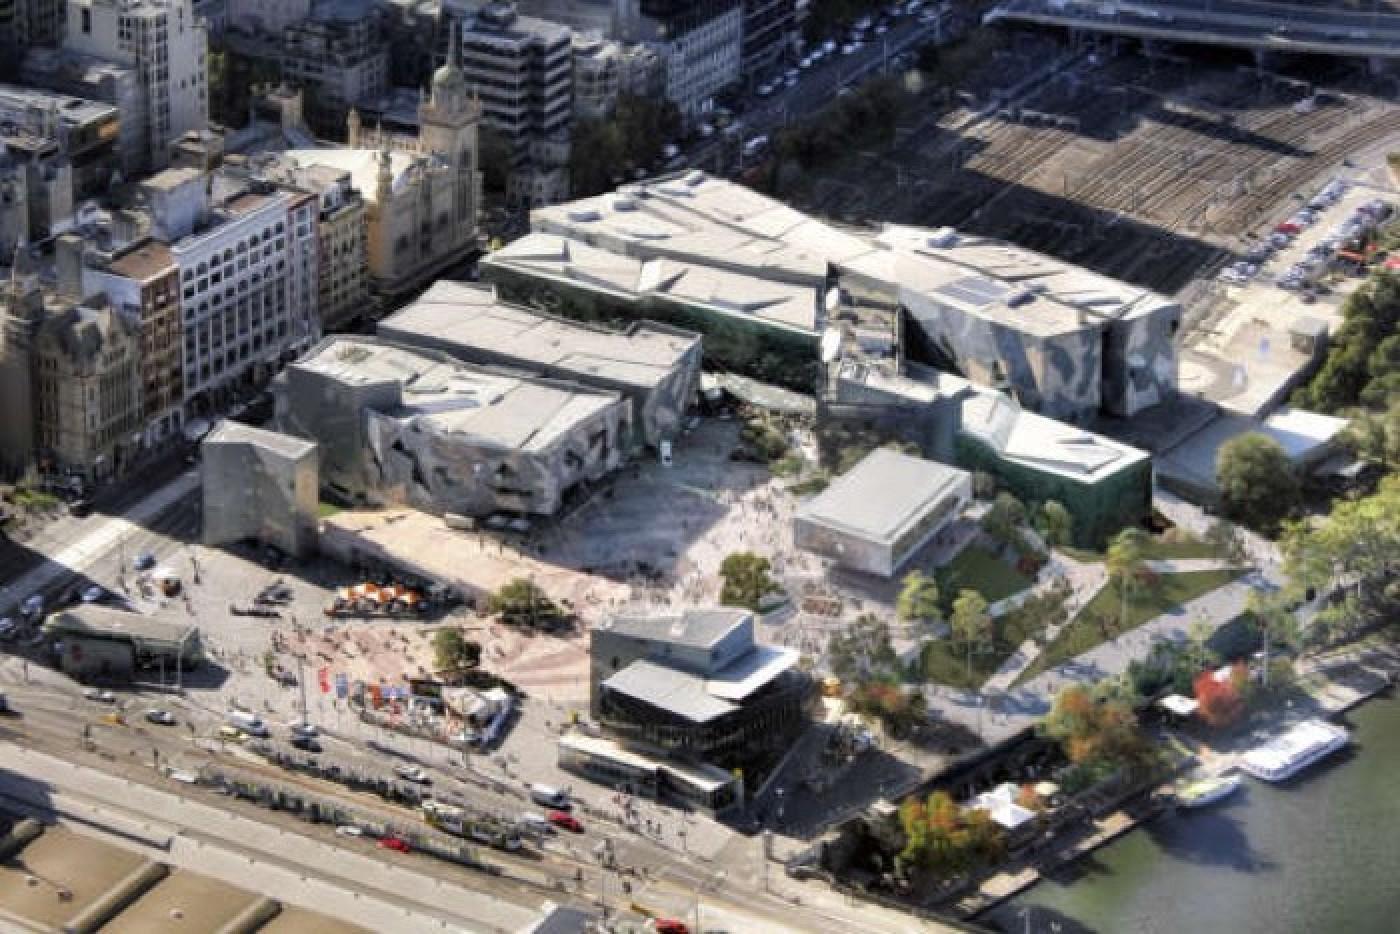 newfederationsquaredesign - Thiết kế của cửa hàng Apple Federation Square Melbourne được tiết lộ